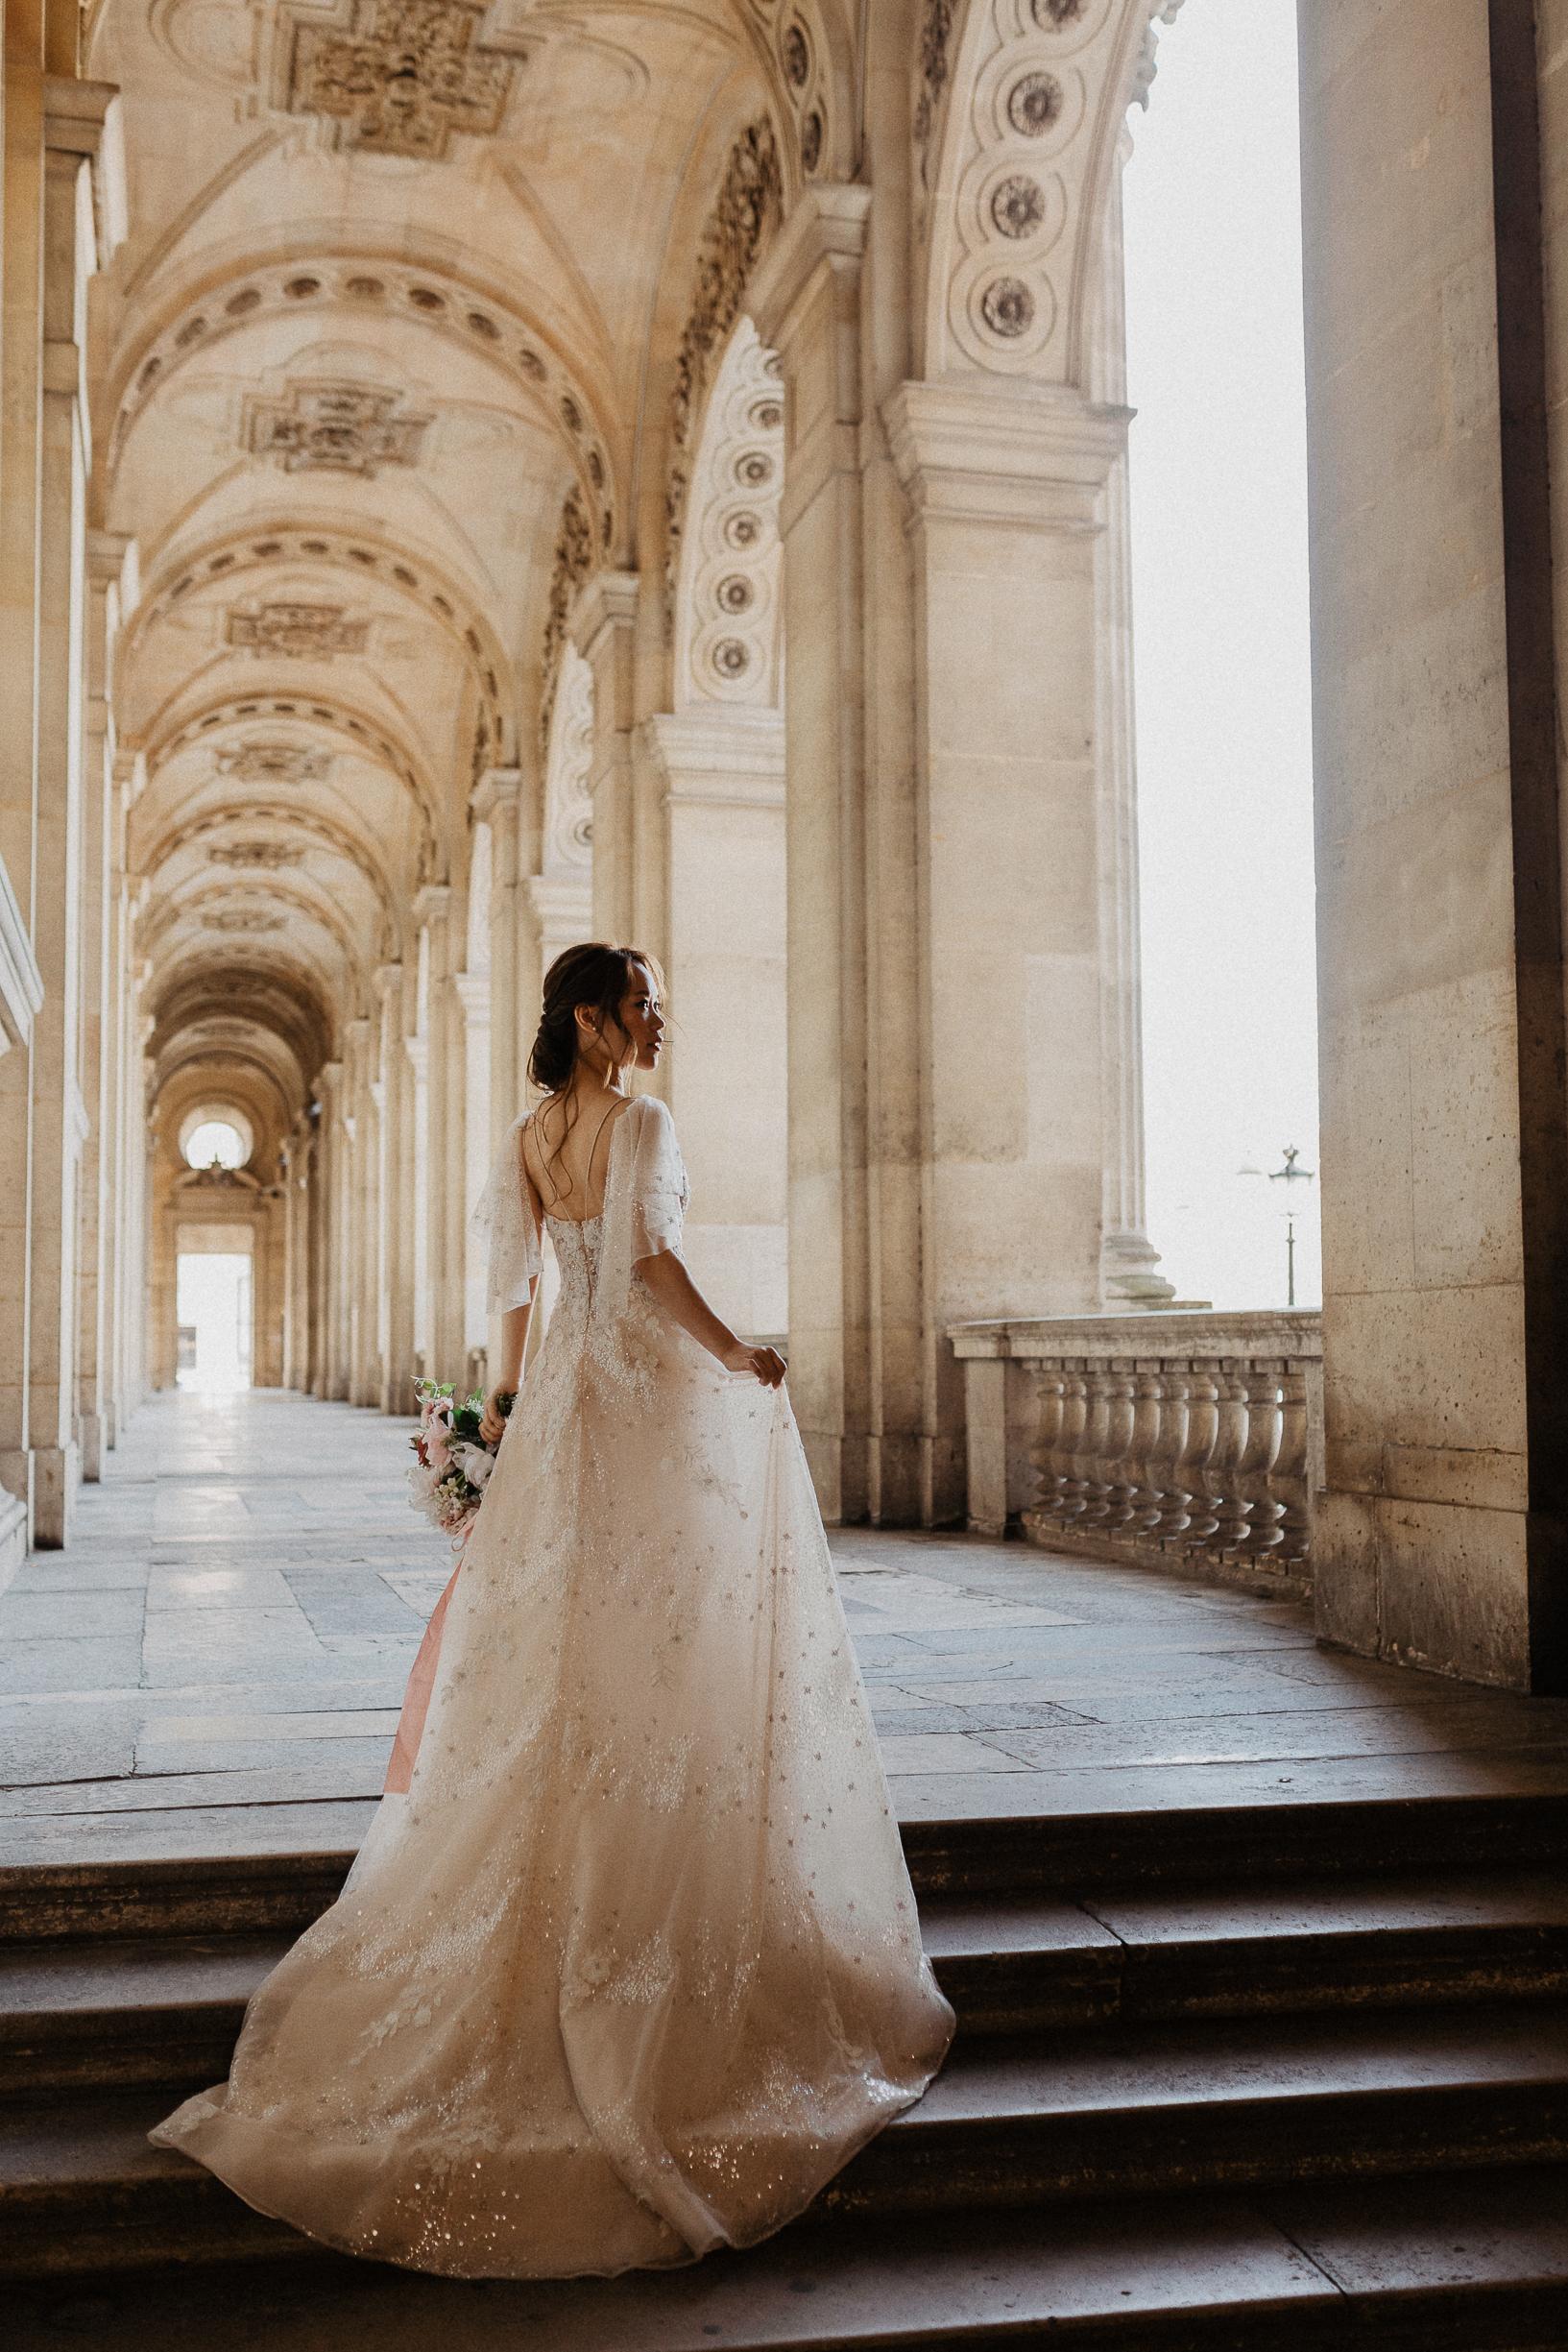 Bride portrait in Louvre museum for Paris wedding